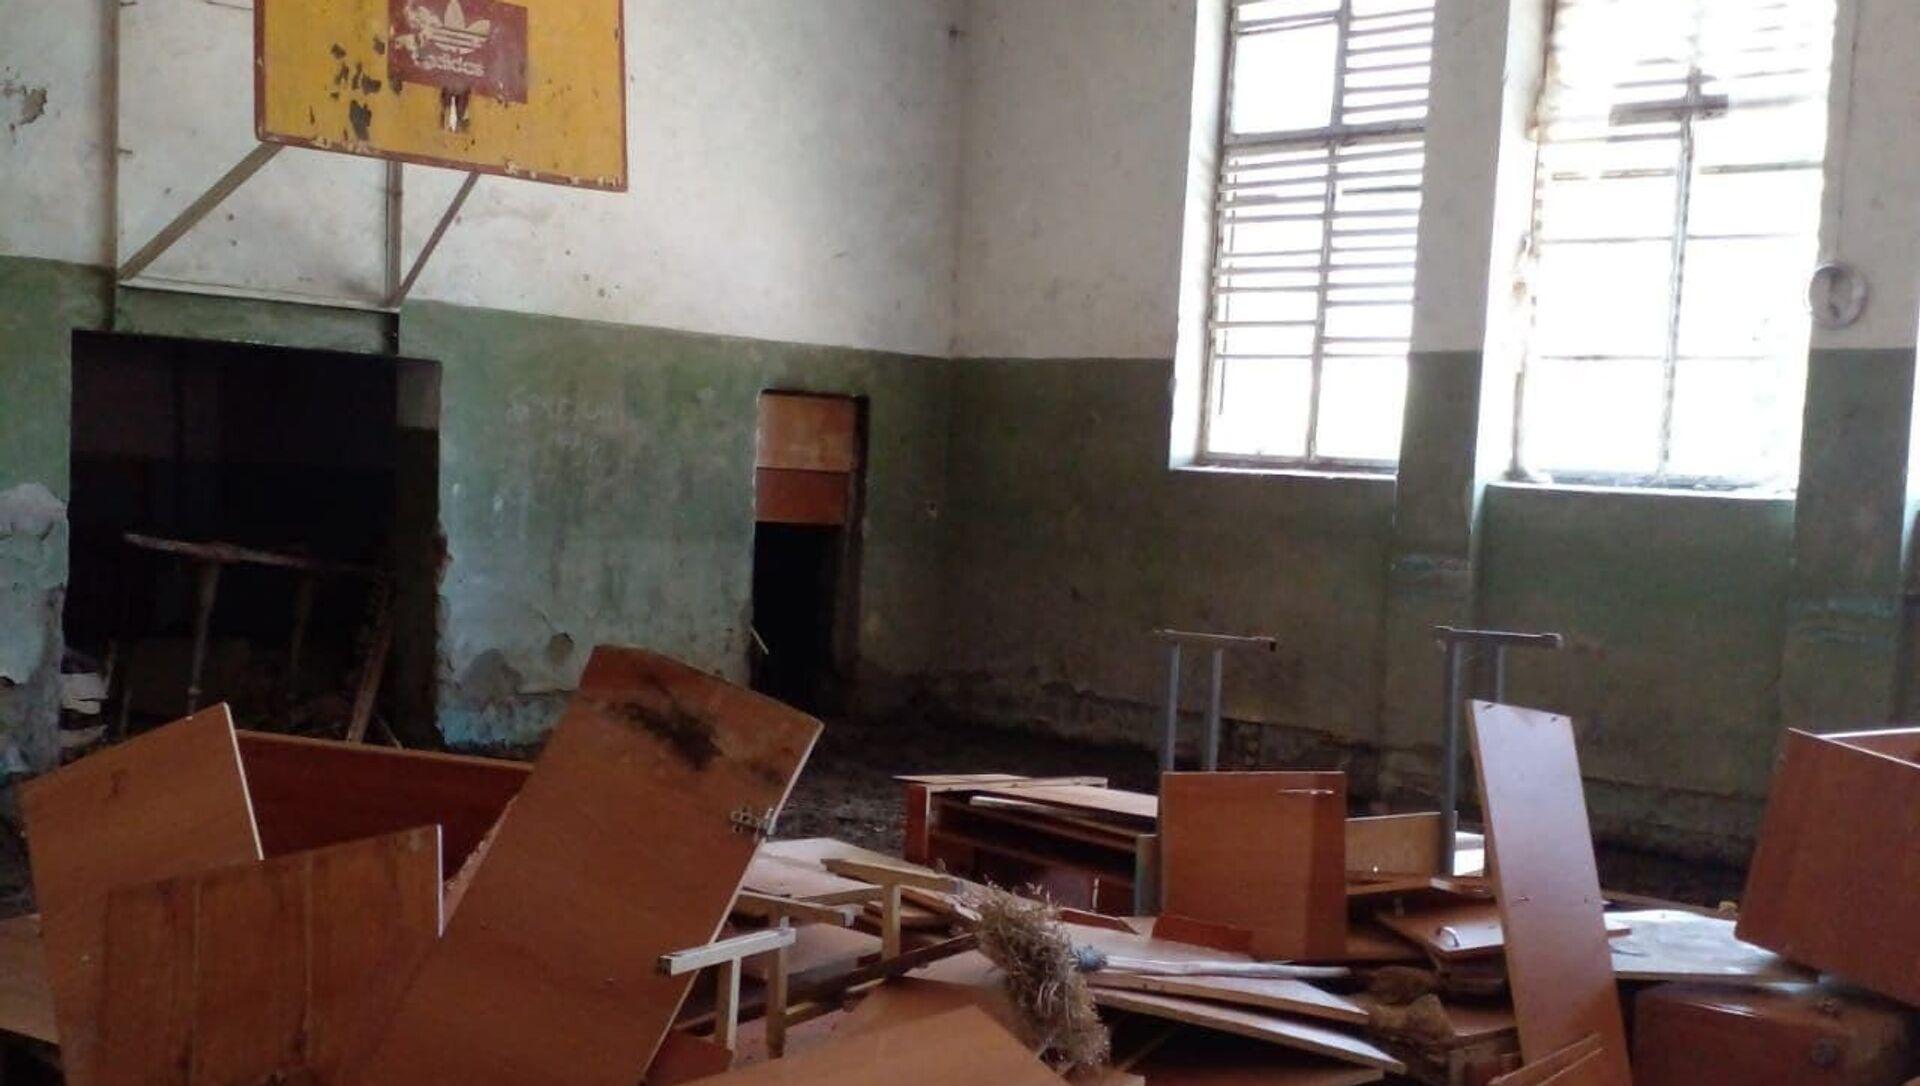 Последствия потопа в школе на Чанба  - Sputnik Абхазия, 1920, 30.08.2021